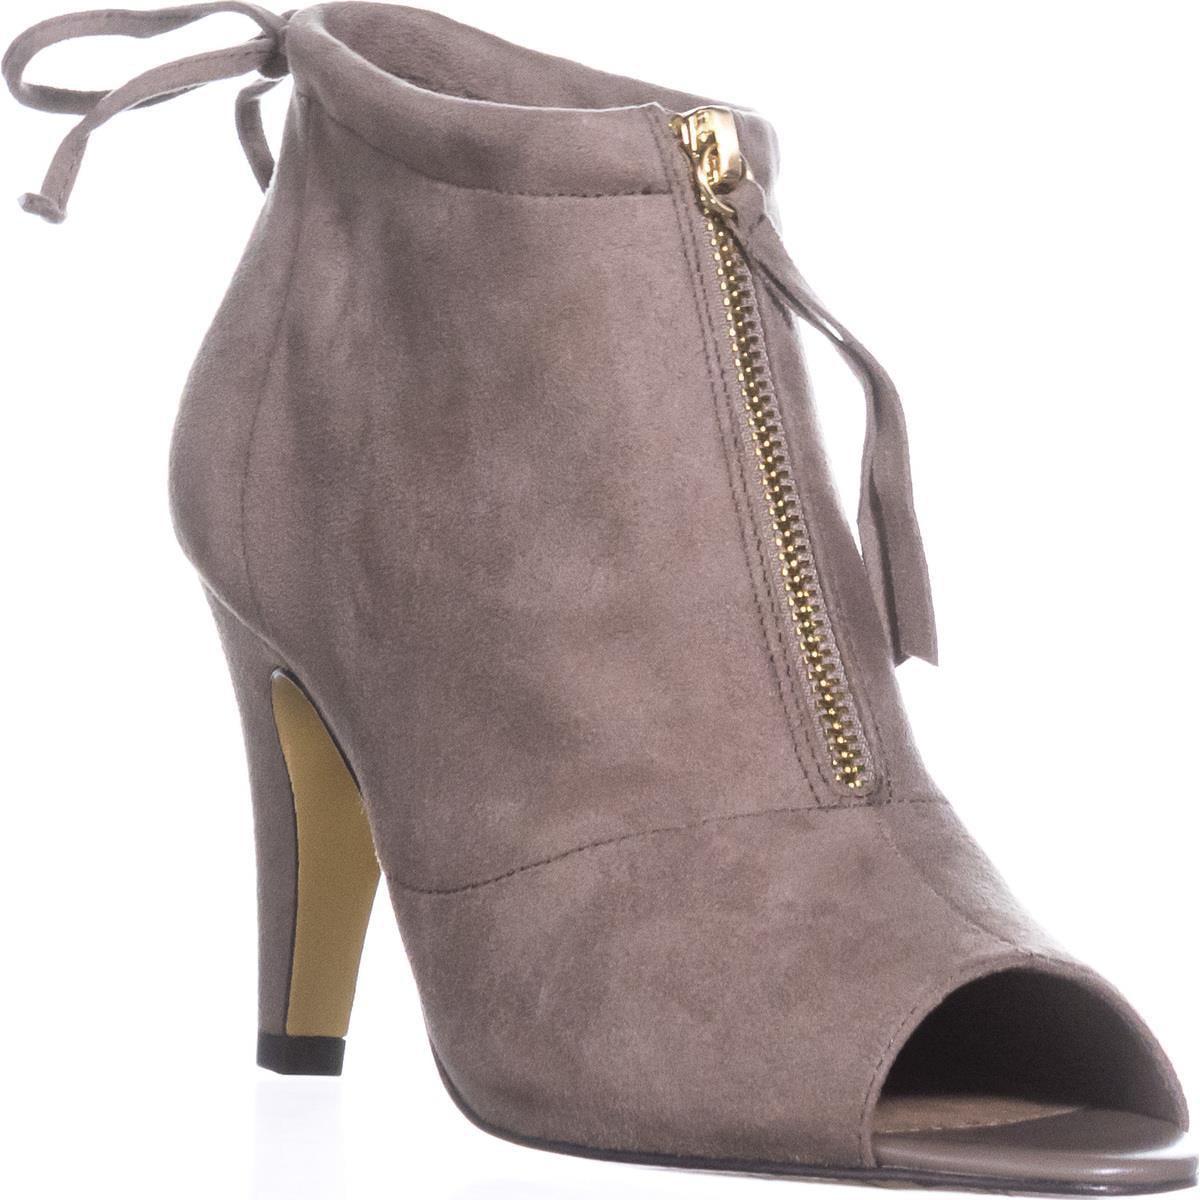 Womens Bella Vita Nicky II Peep-Toe Ankle Boots, Stone by Bella Vita